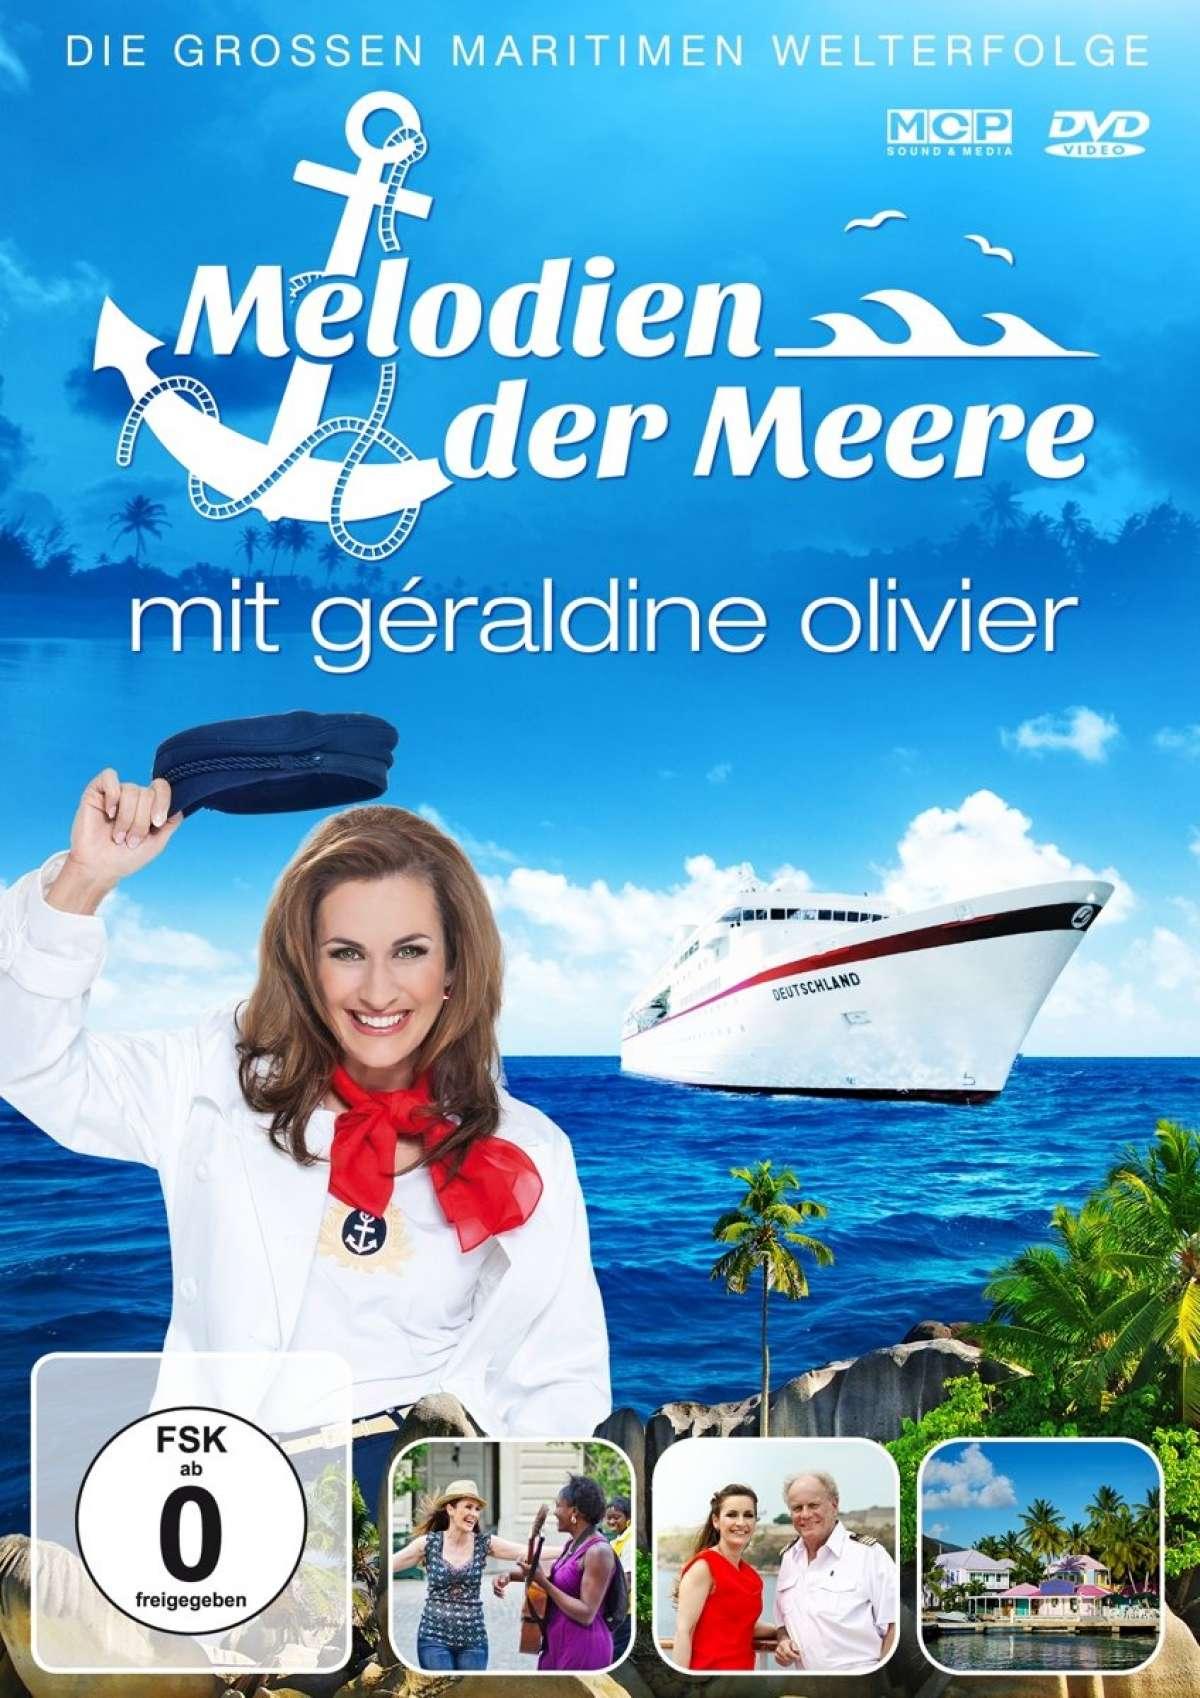 Meeresmelodien und Shanties mit Géraldine Olivier in Homberg (Efze)